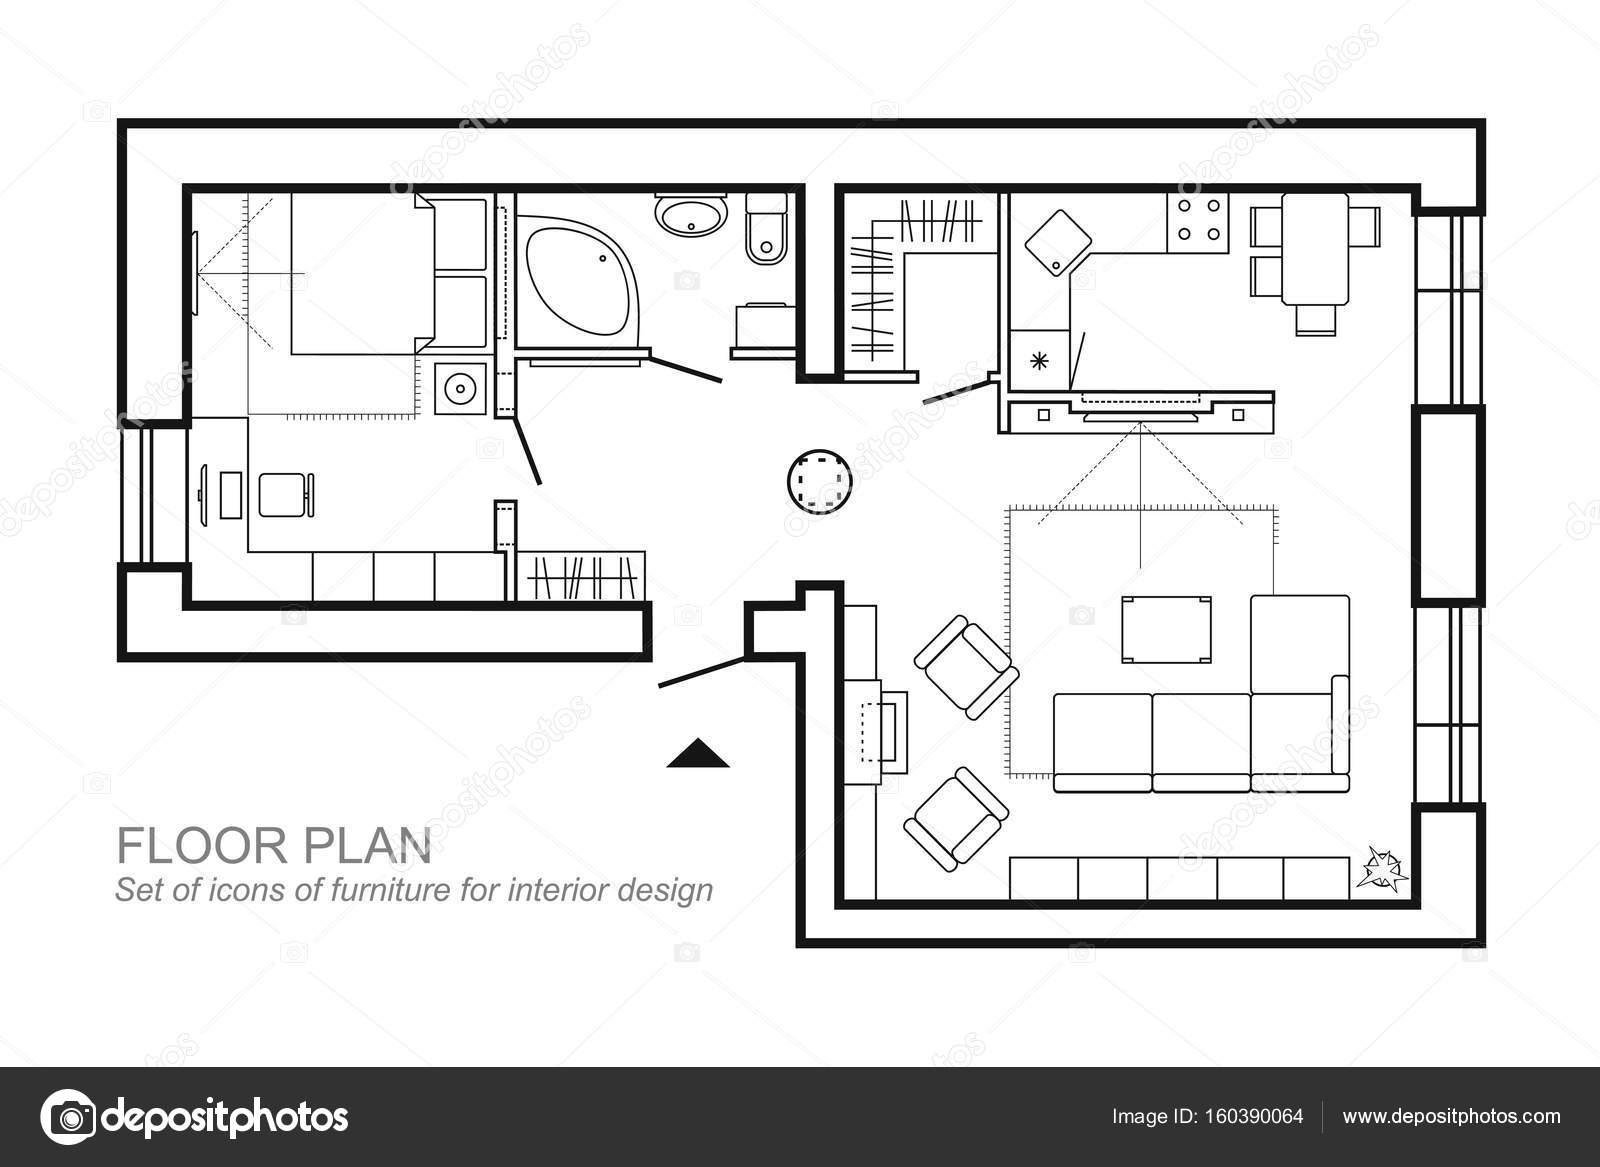 outline vector of simple furniture plan floor plan symbol as